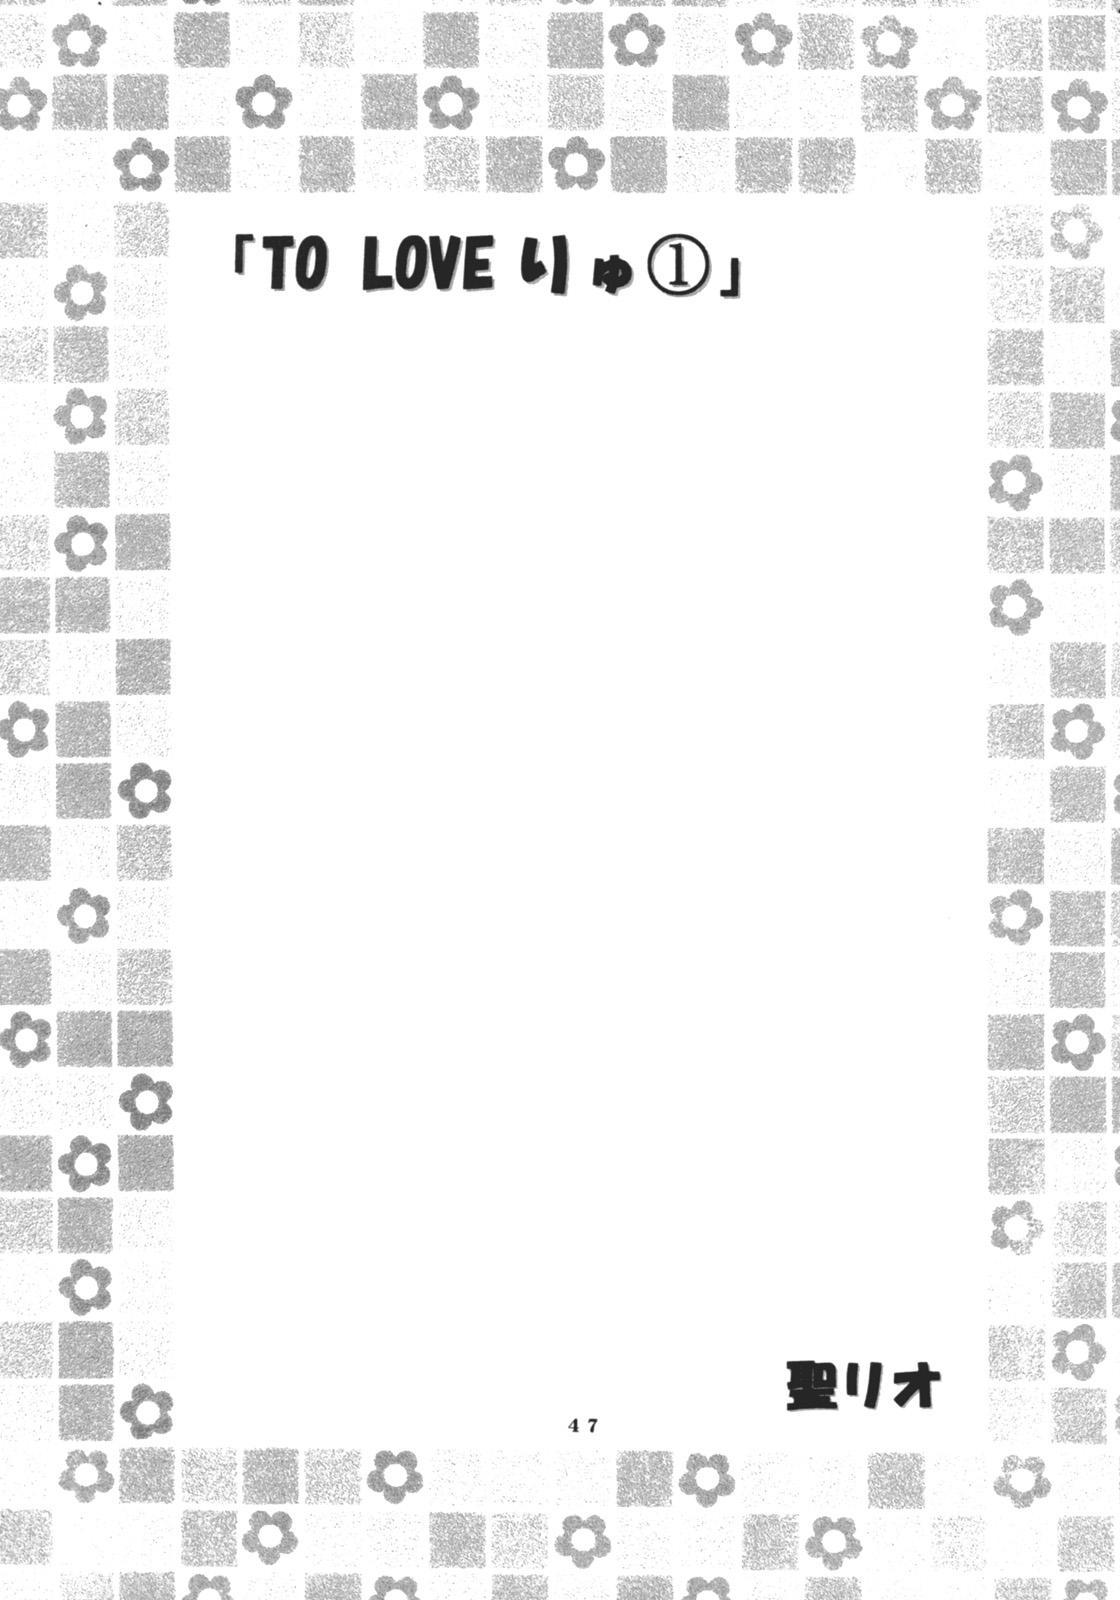 ToLOVE Ryu Vol. 1 47